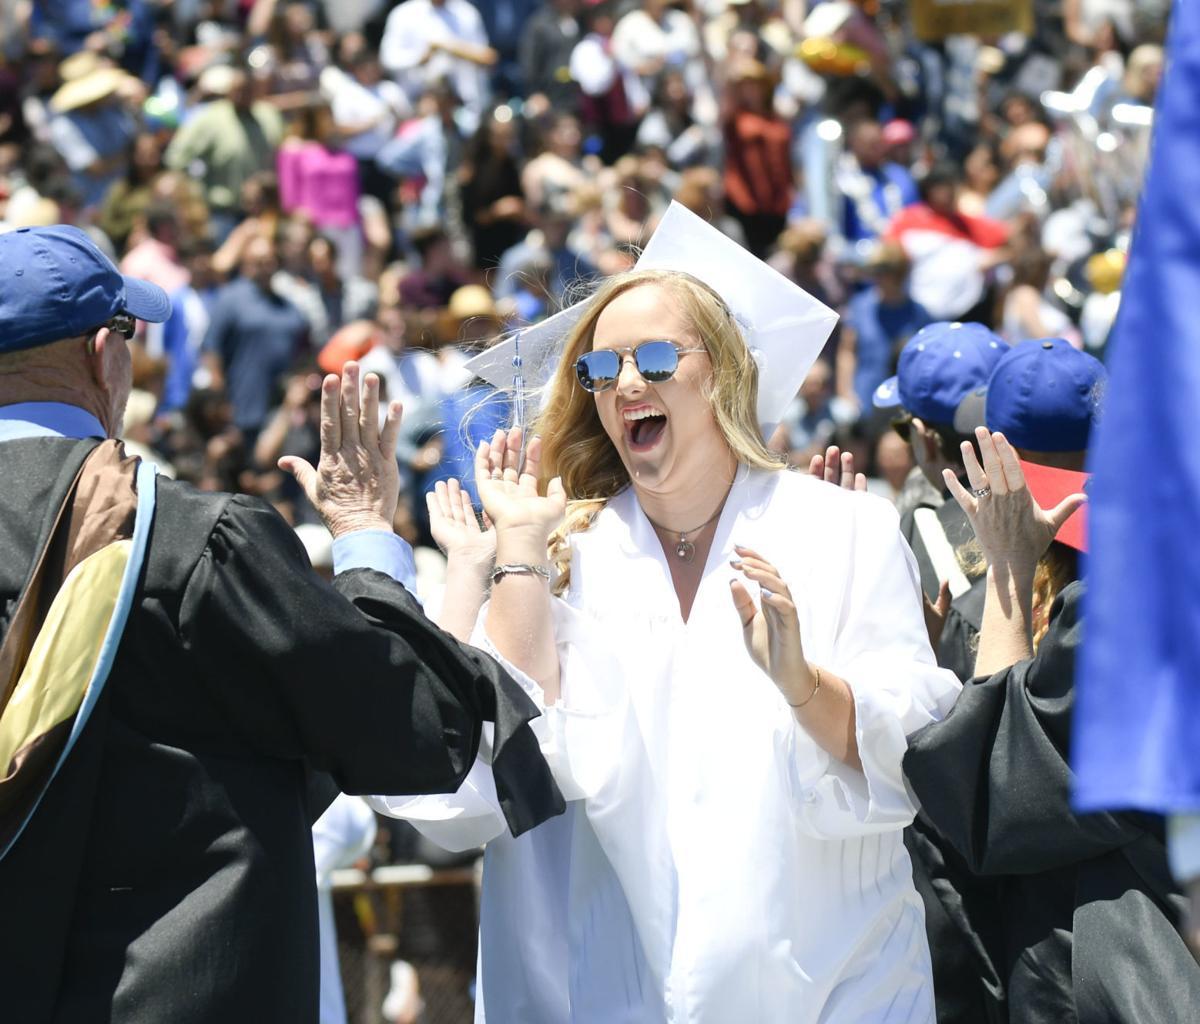 060619 Lompoc graduation 02.jpg